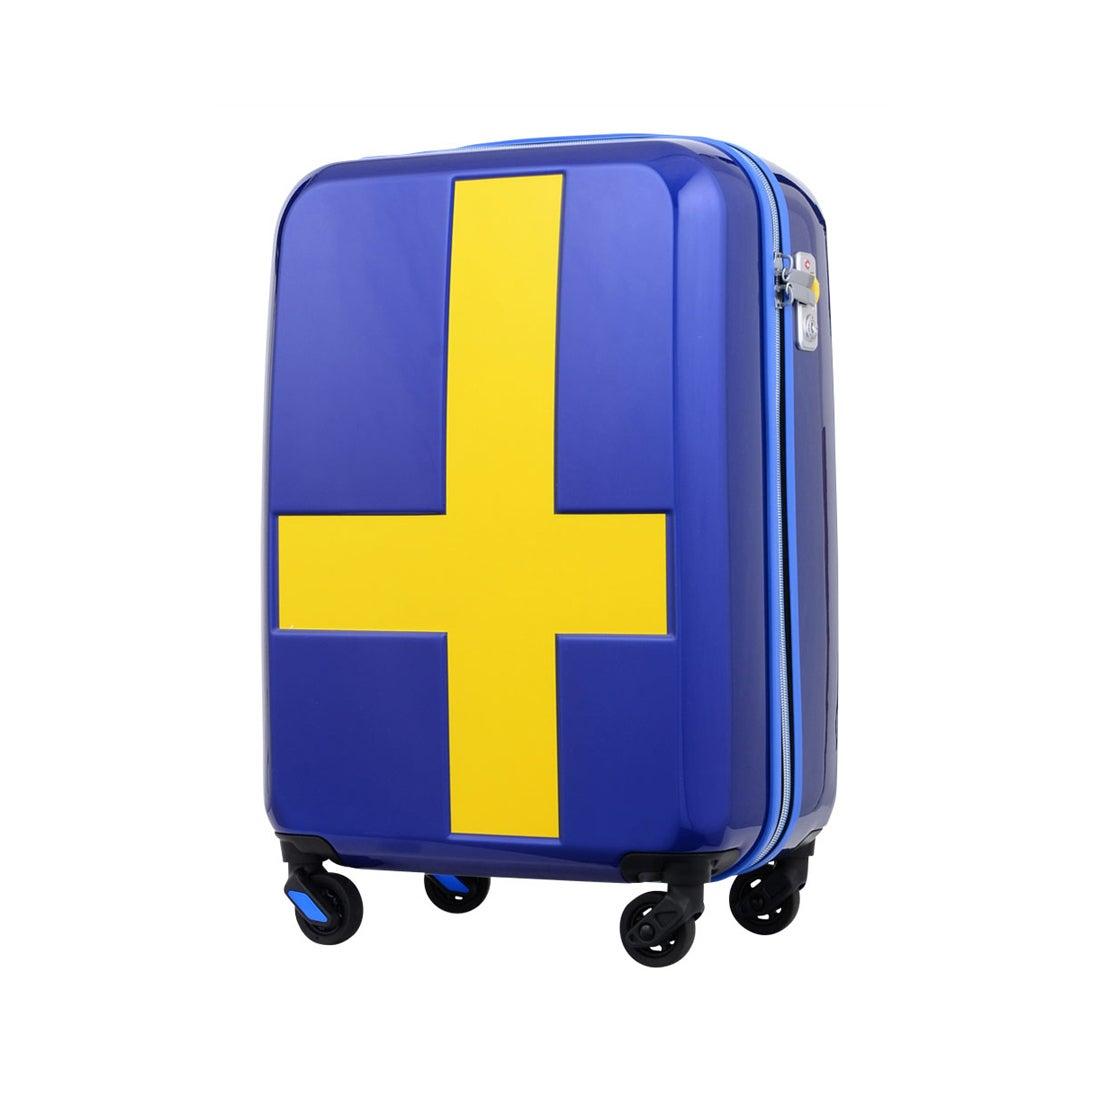 【SAC'S BAR】イノベーター スーツケース INV55/55T 55cm 【INV55T】S.BLUE/YELLO メンズ